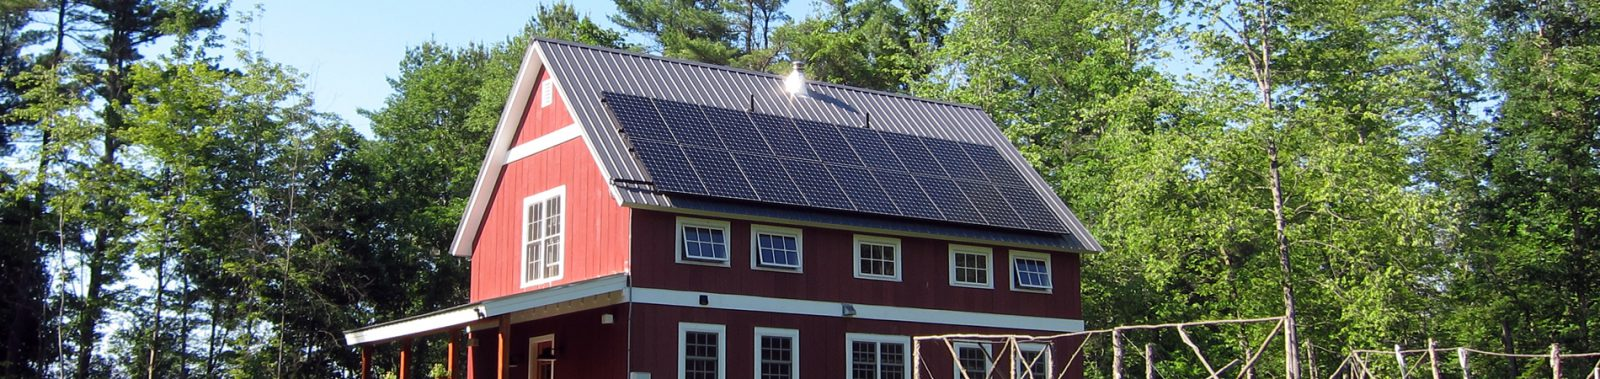 Home Solar Header Image 2